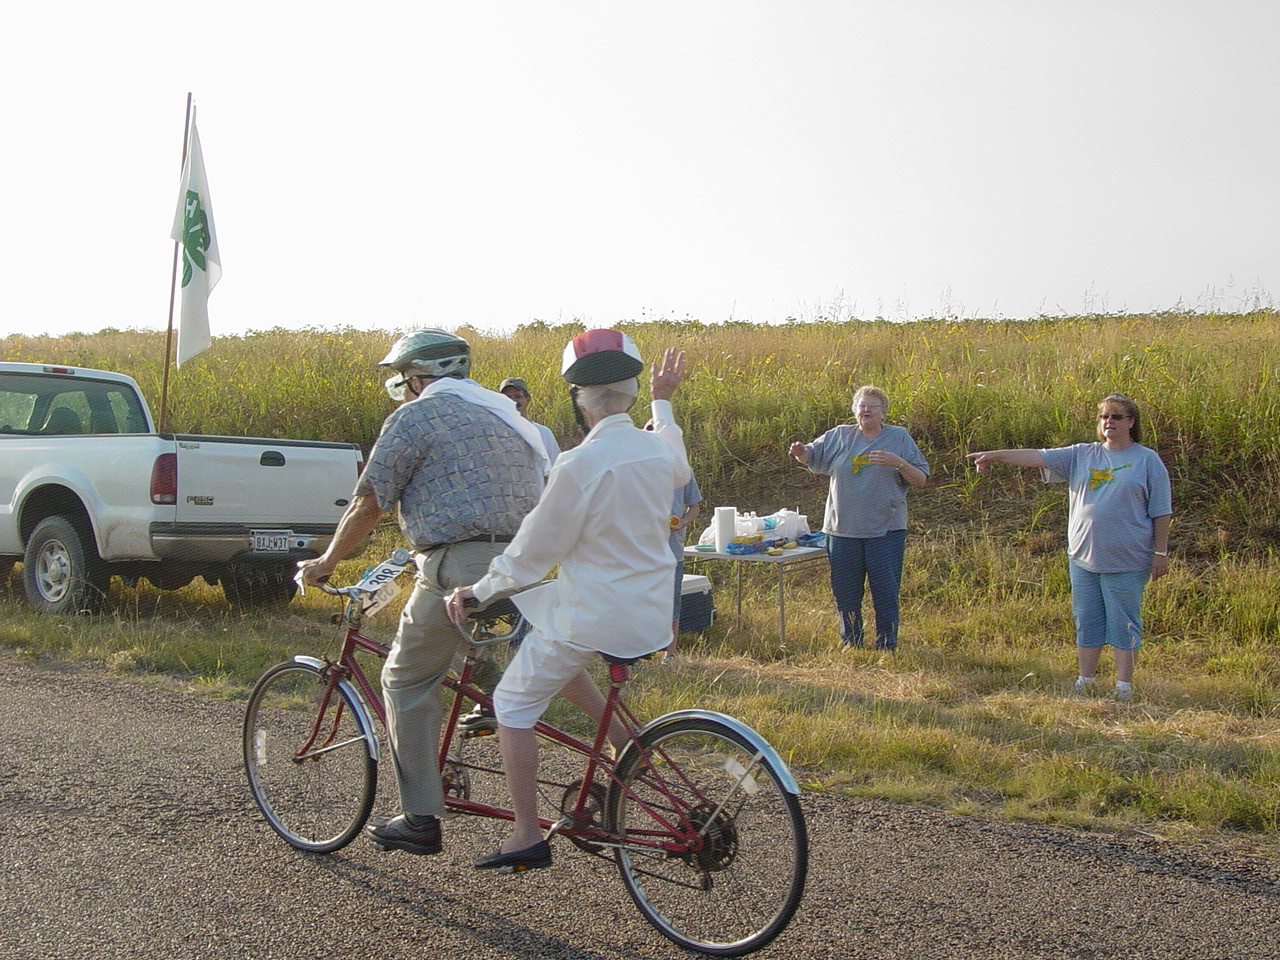 Photo of Tour d' Cotton courtesy of Judy Johnson.